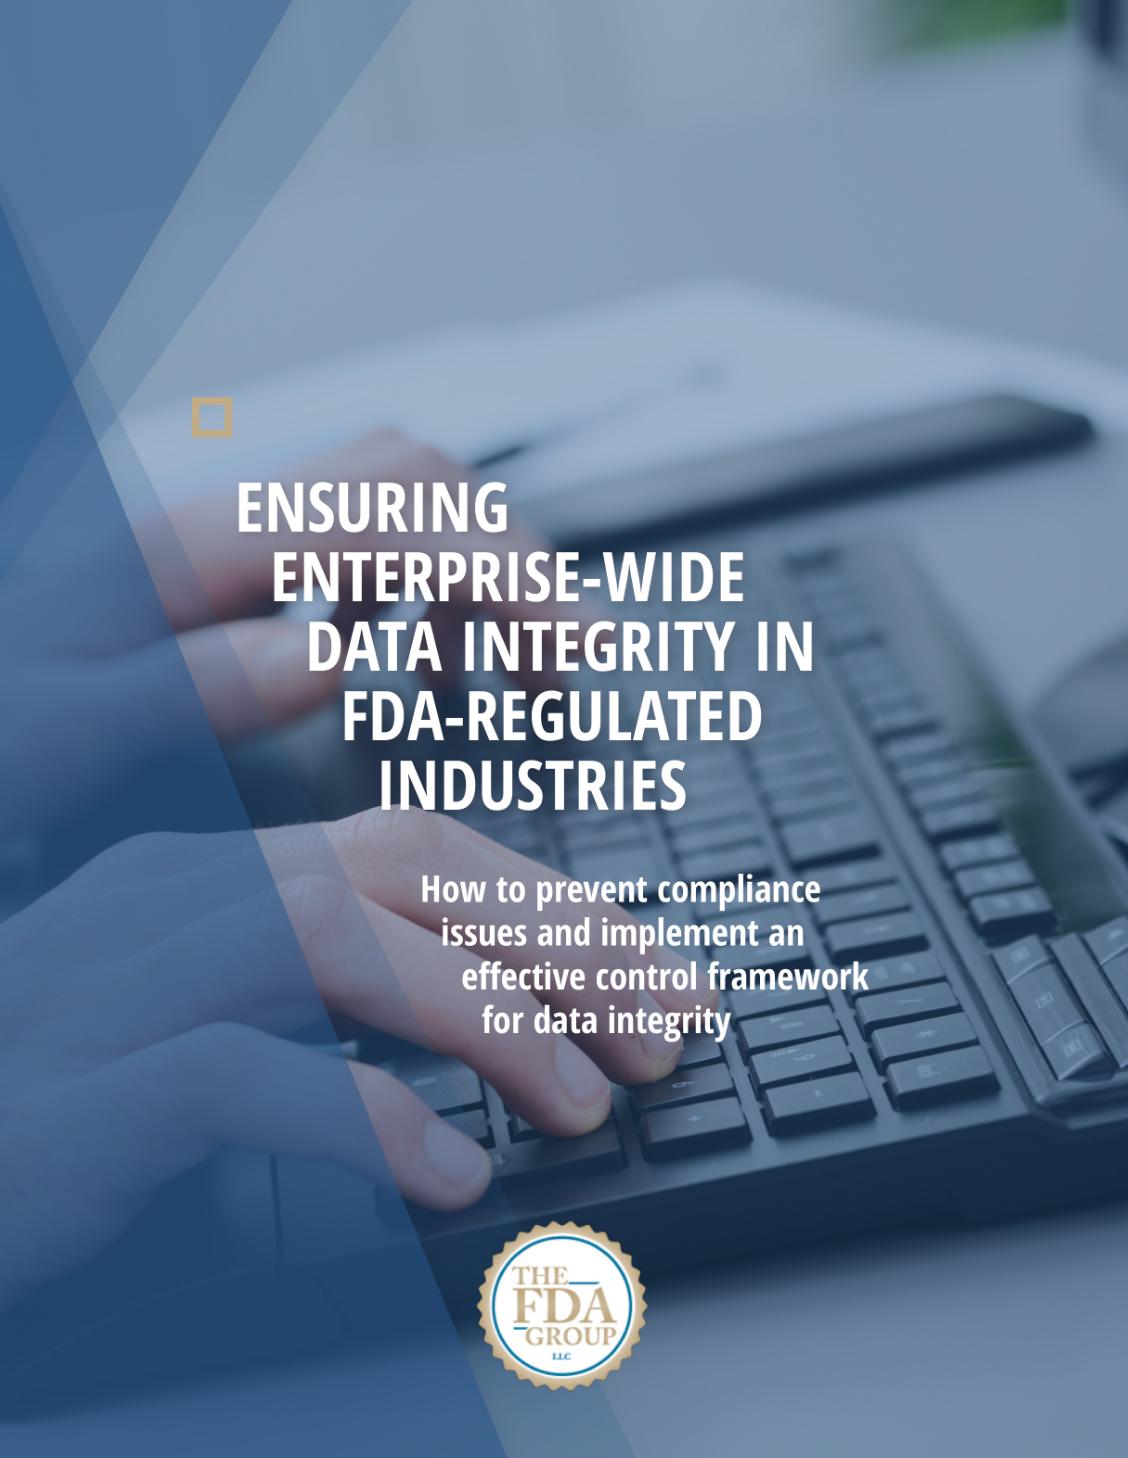 Ensuring Enterprise-Wide Data Integrity